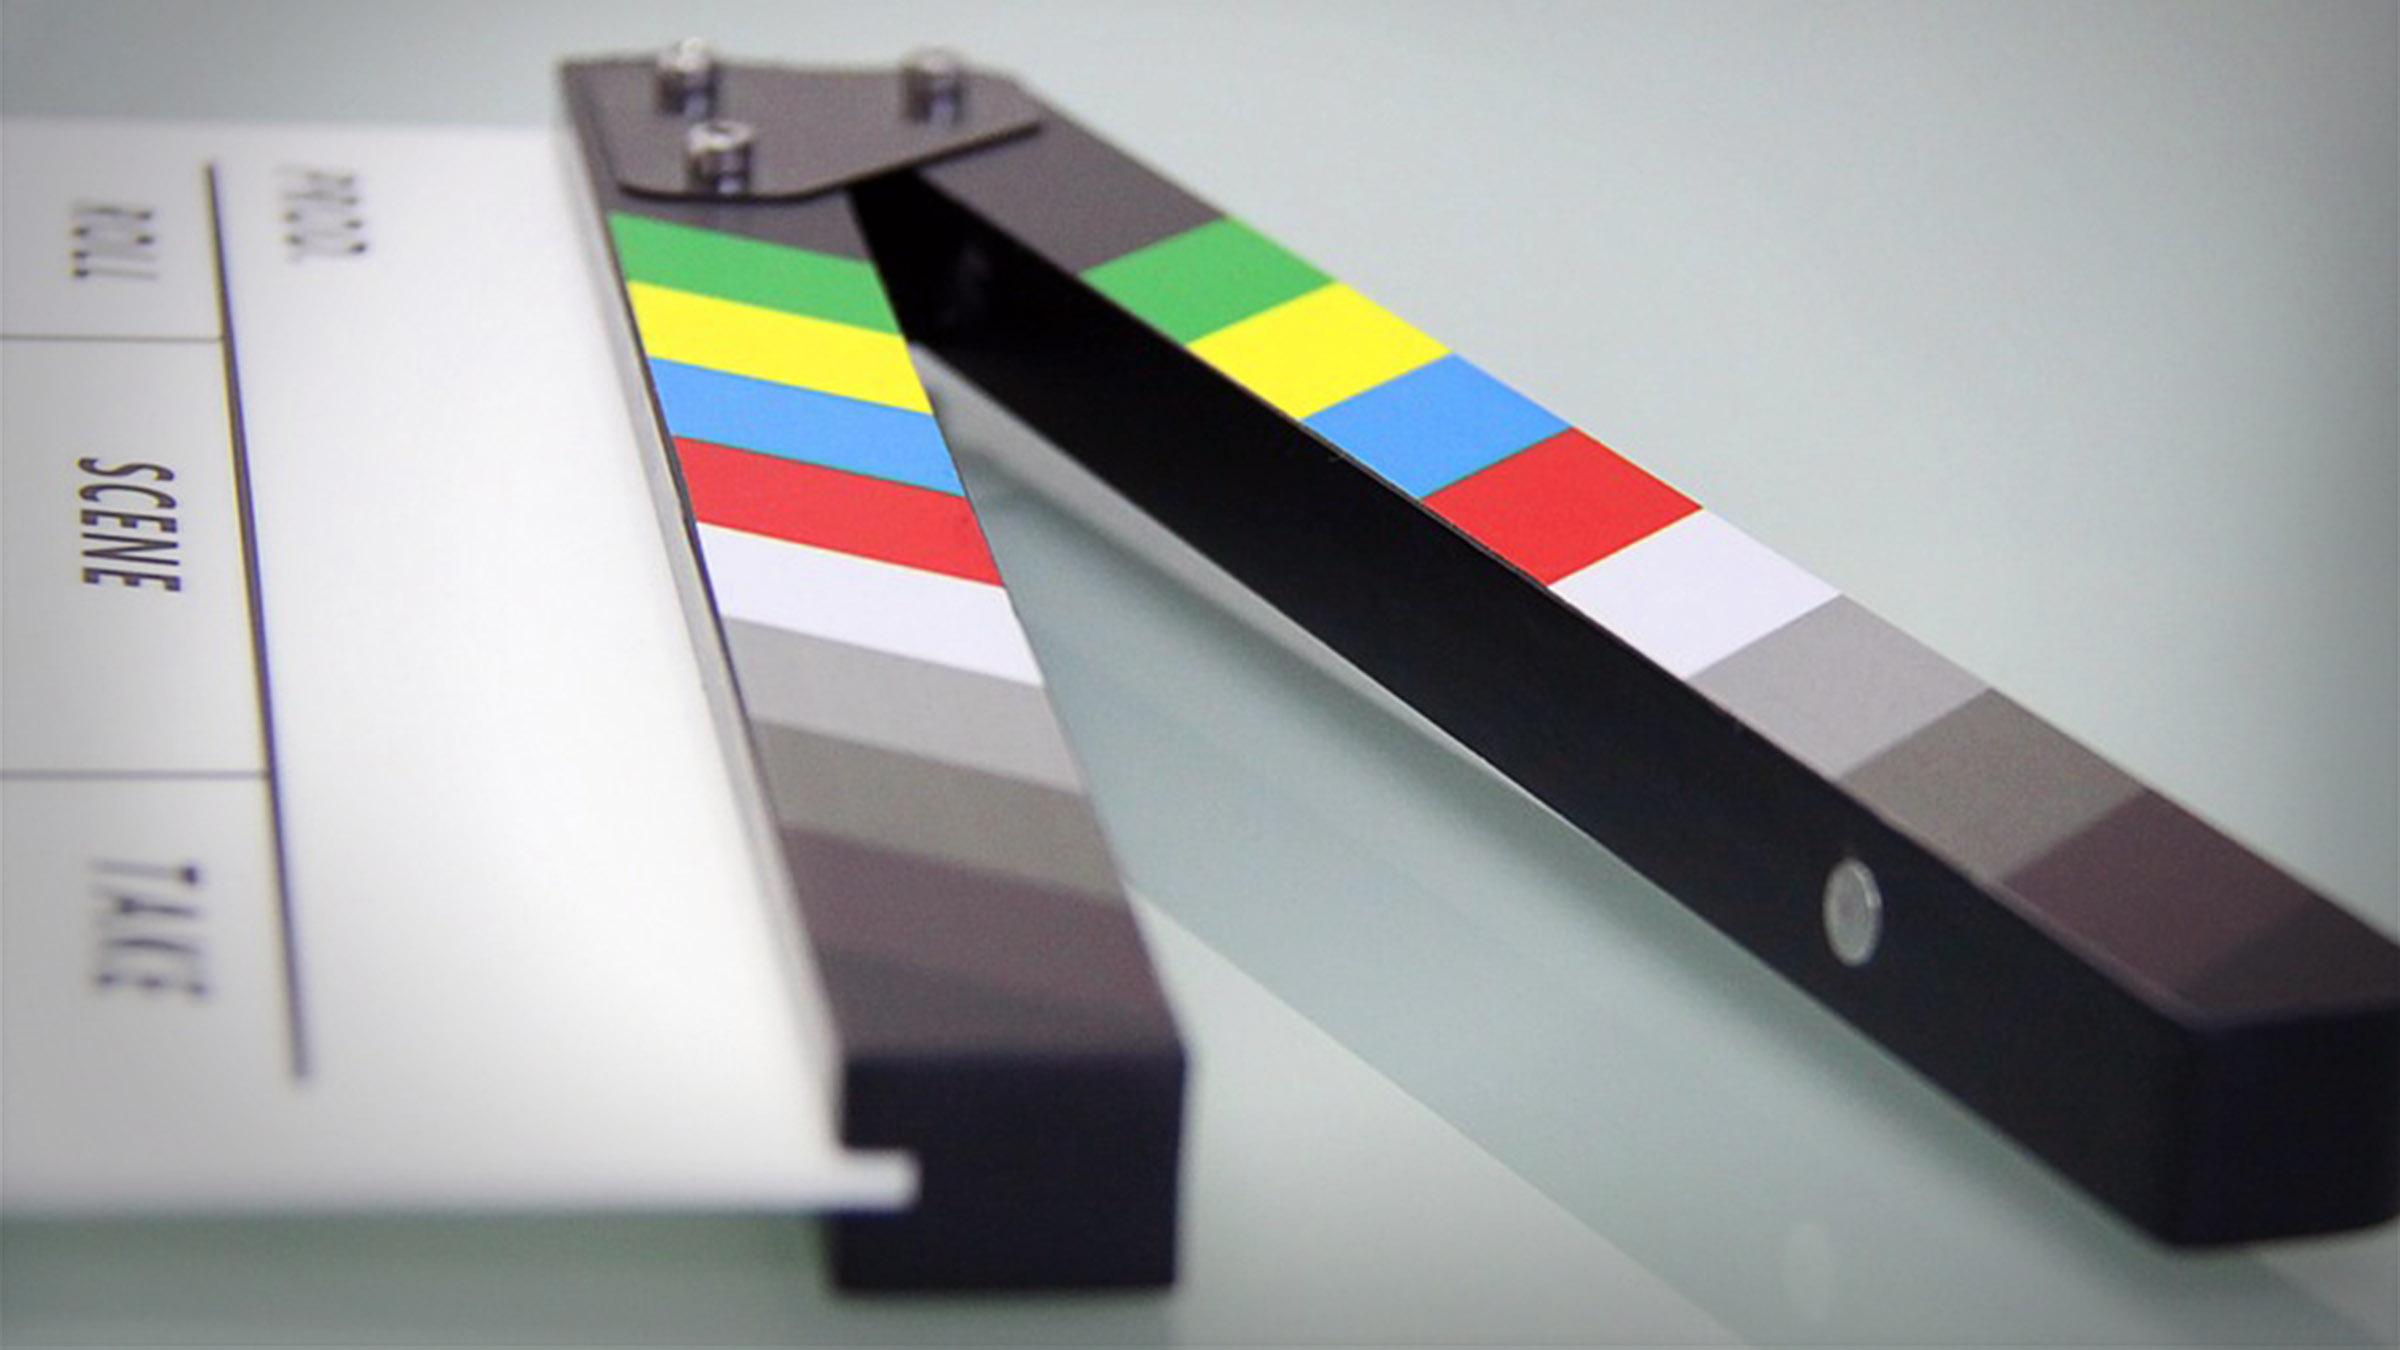 Filmmaker pro member reception film independent for 11620 wilshire blvd 9th floor los angeles ca 90025